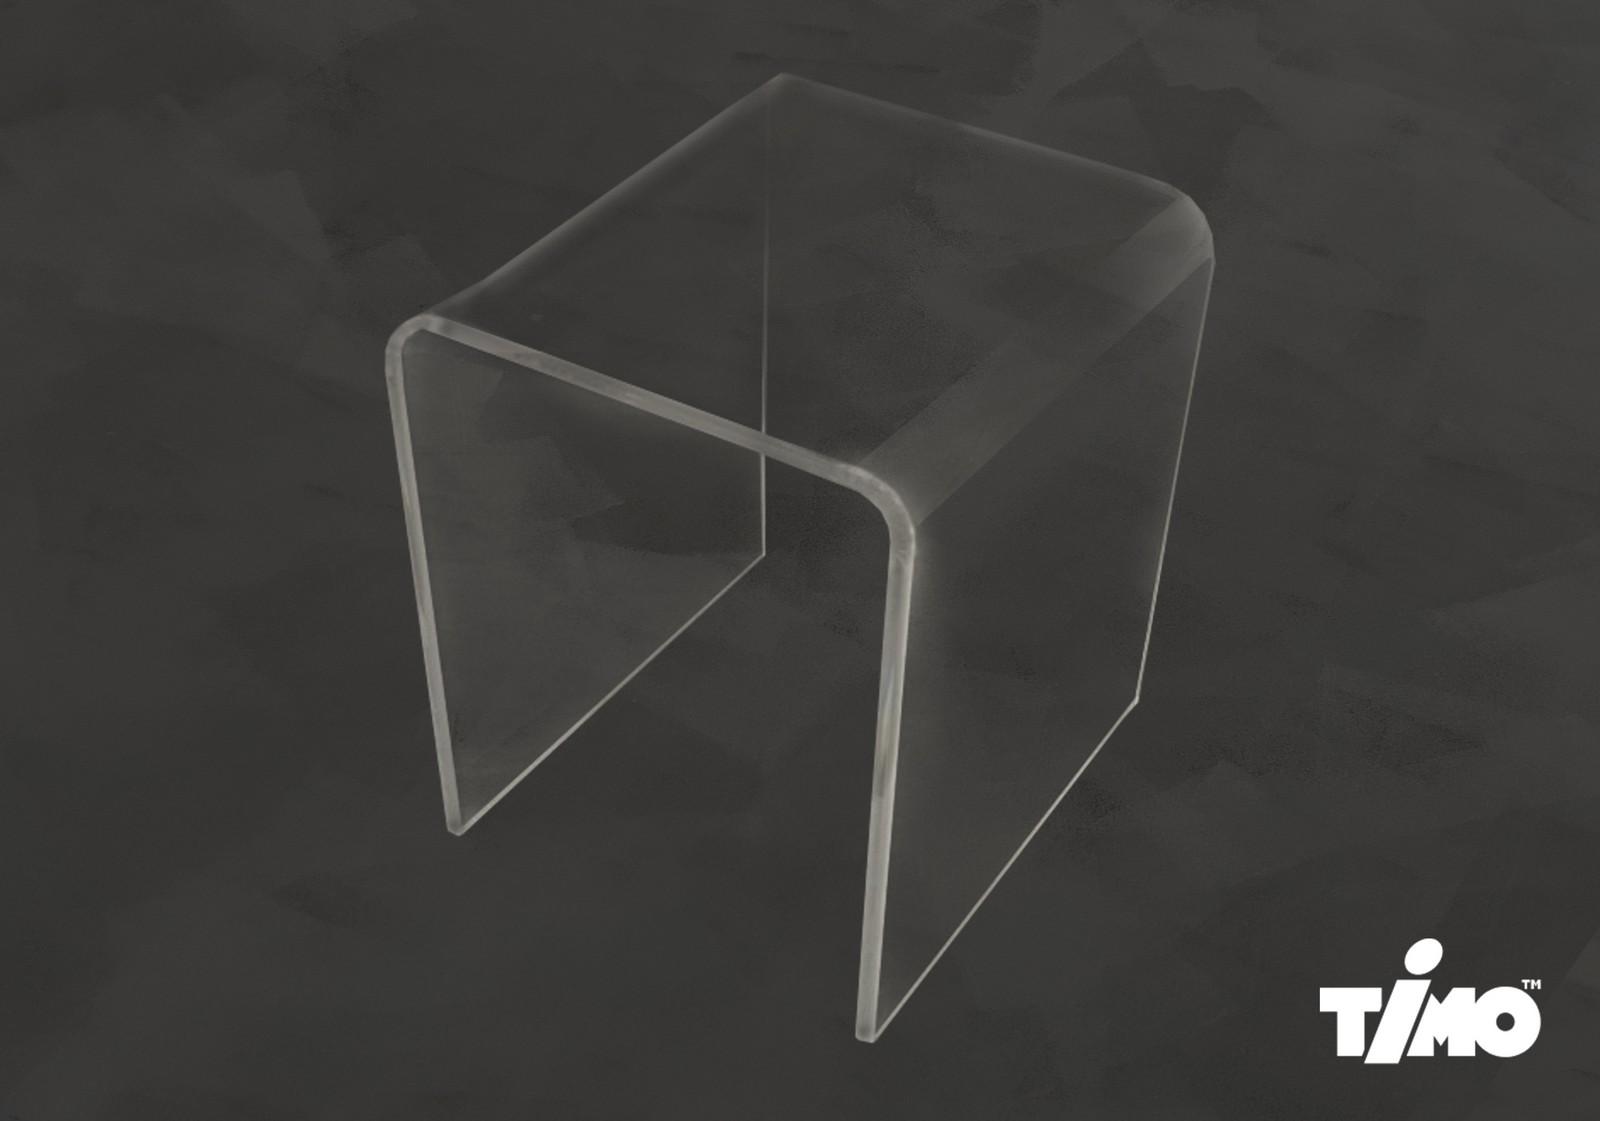 Душевая кабина Timo ILMA 901